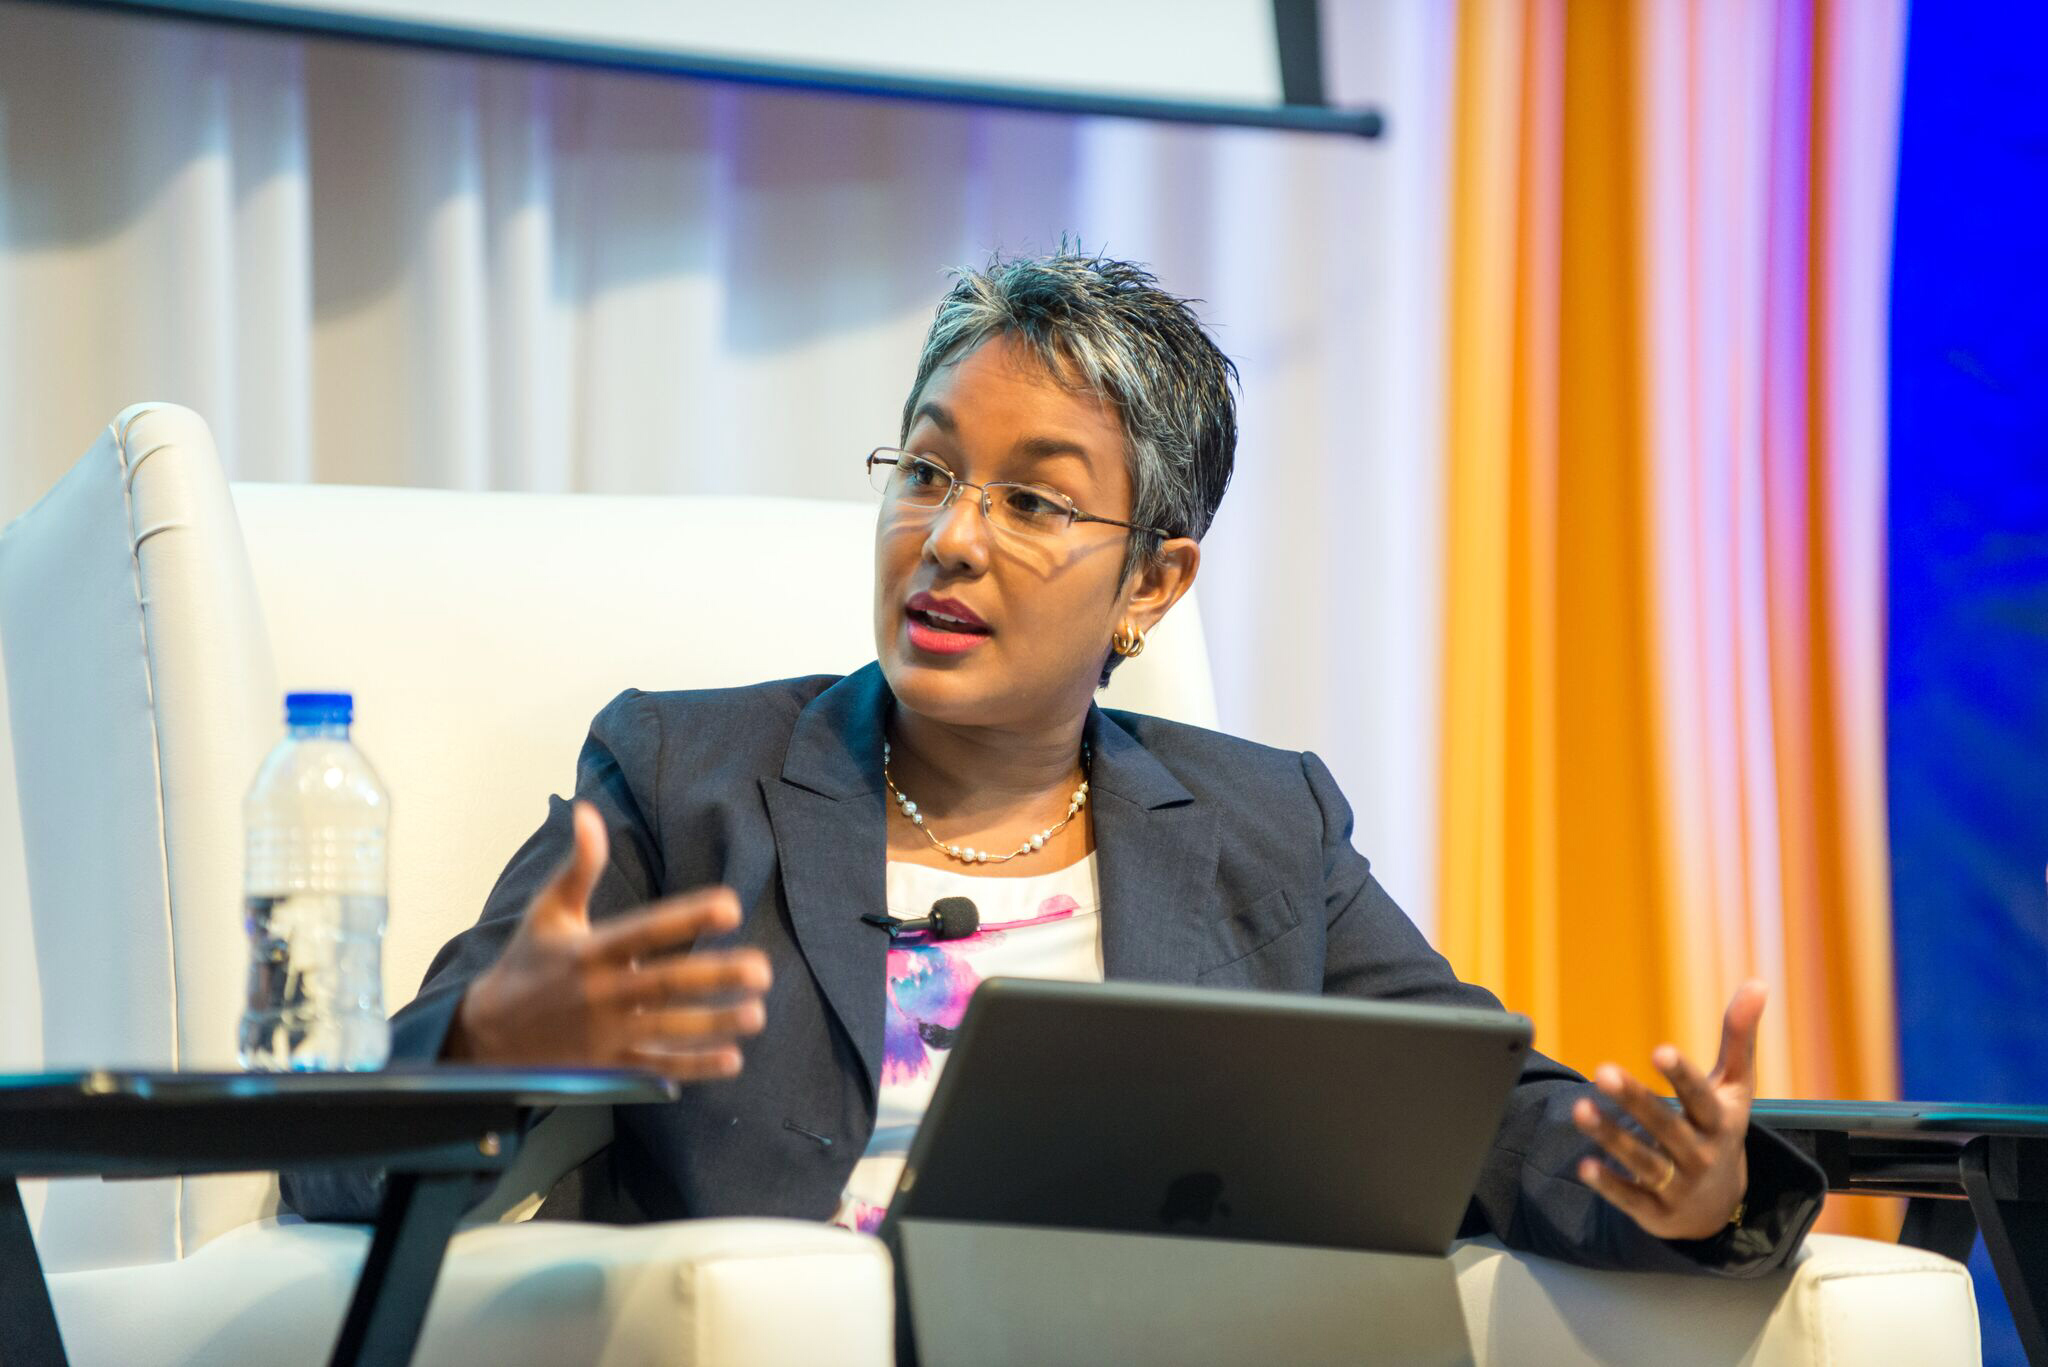 Marla Dukharan Tech Talks Cayman Islands